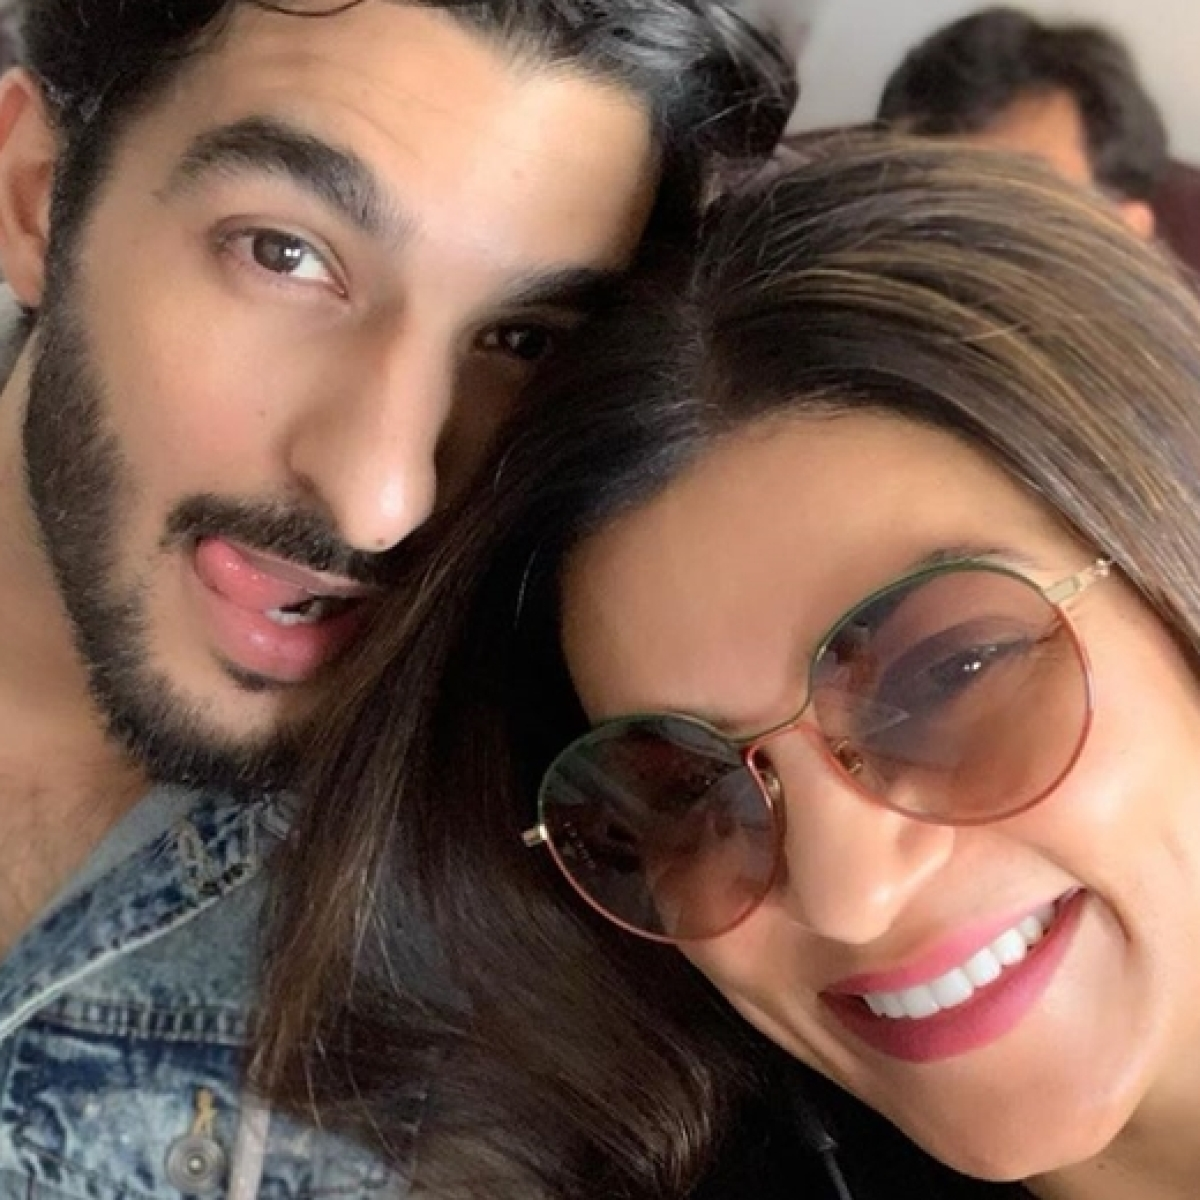 Sushmita Sen claims a news article called her boyfriend 'Rohman Scarf' instead of Rohman Shawl